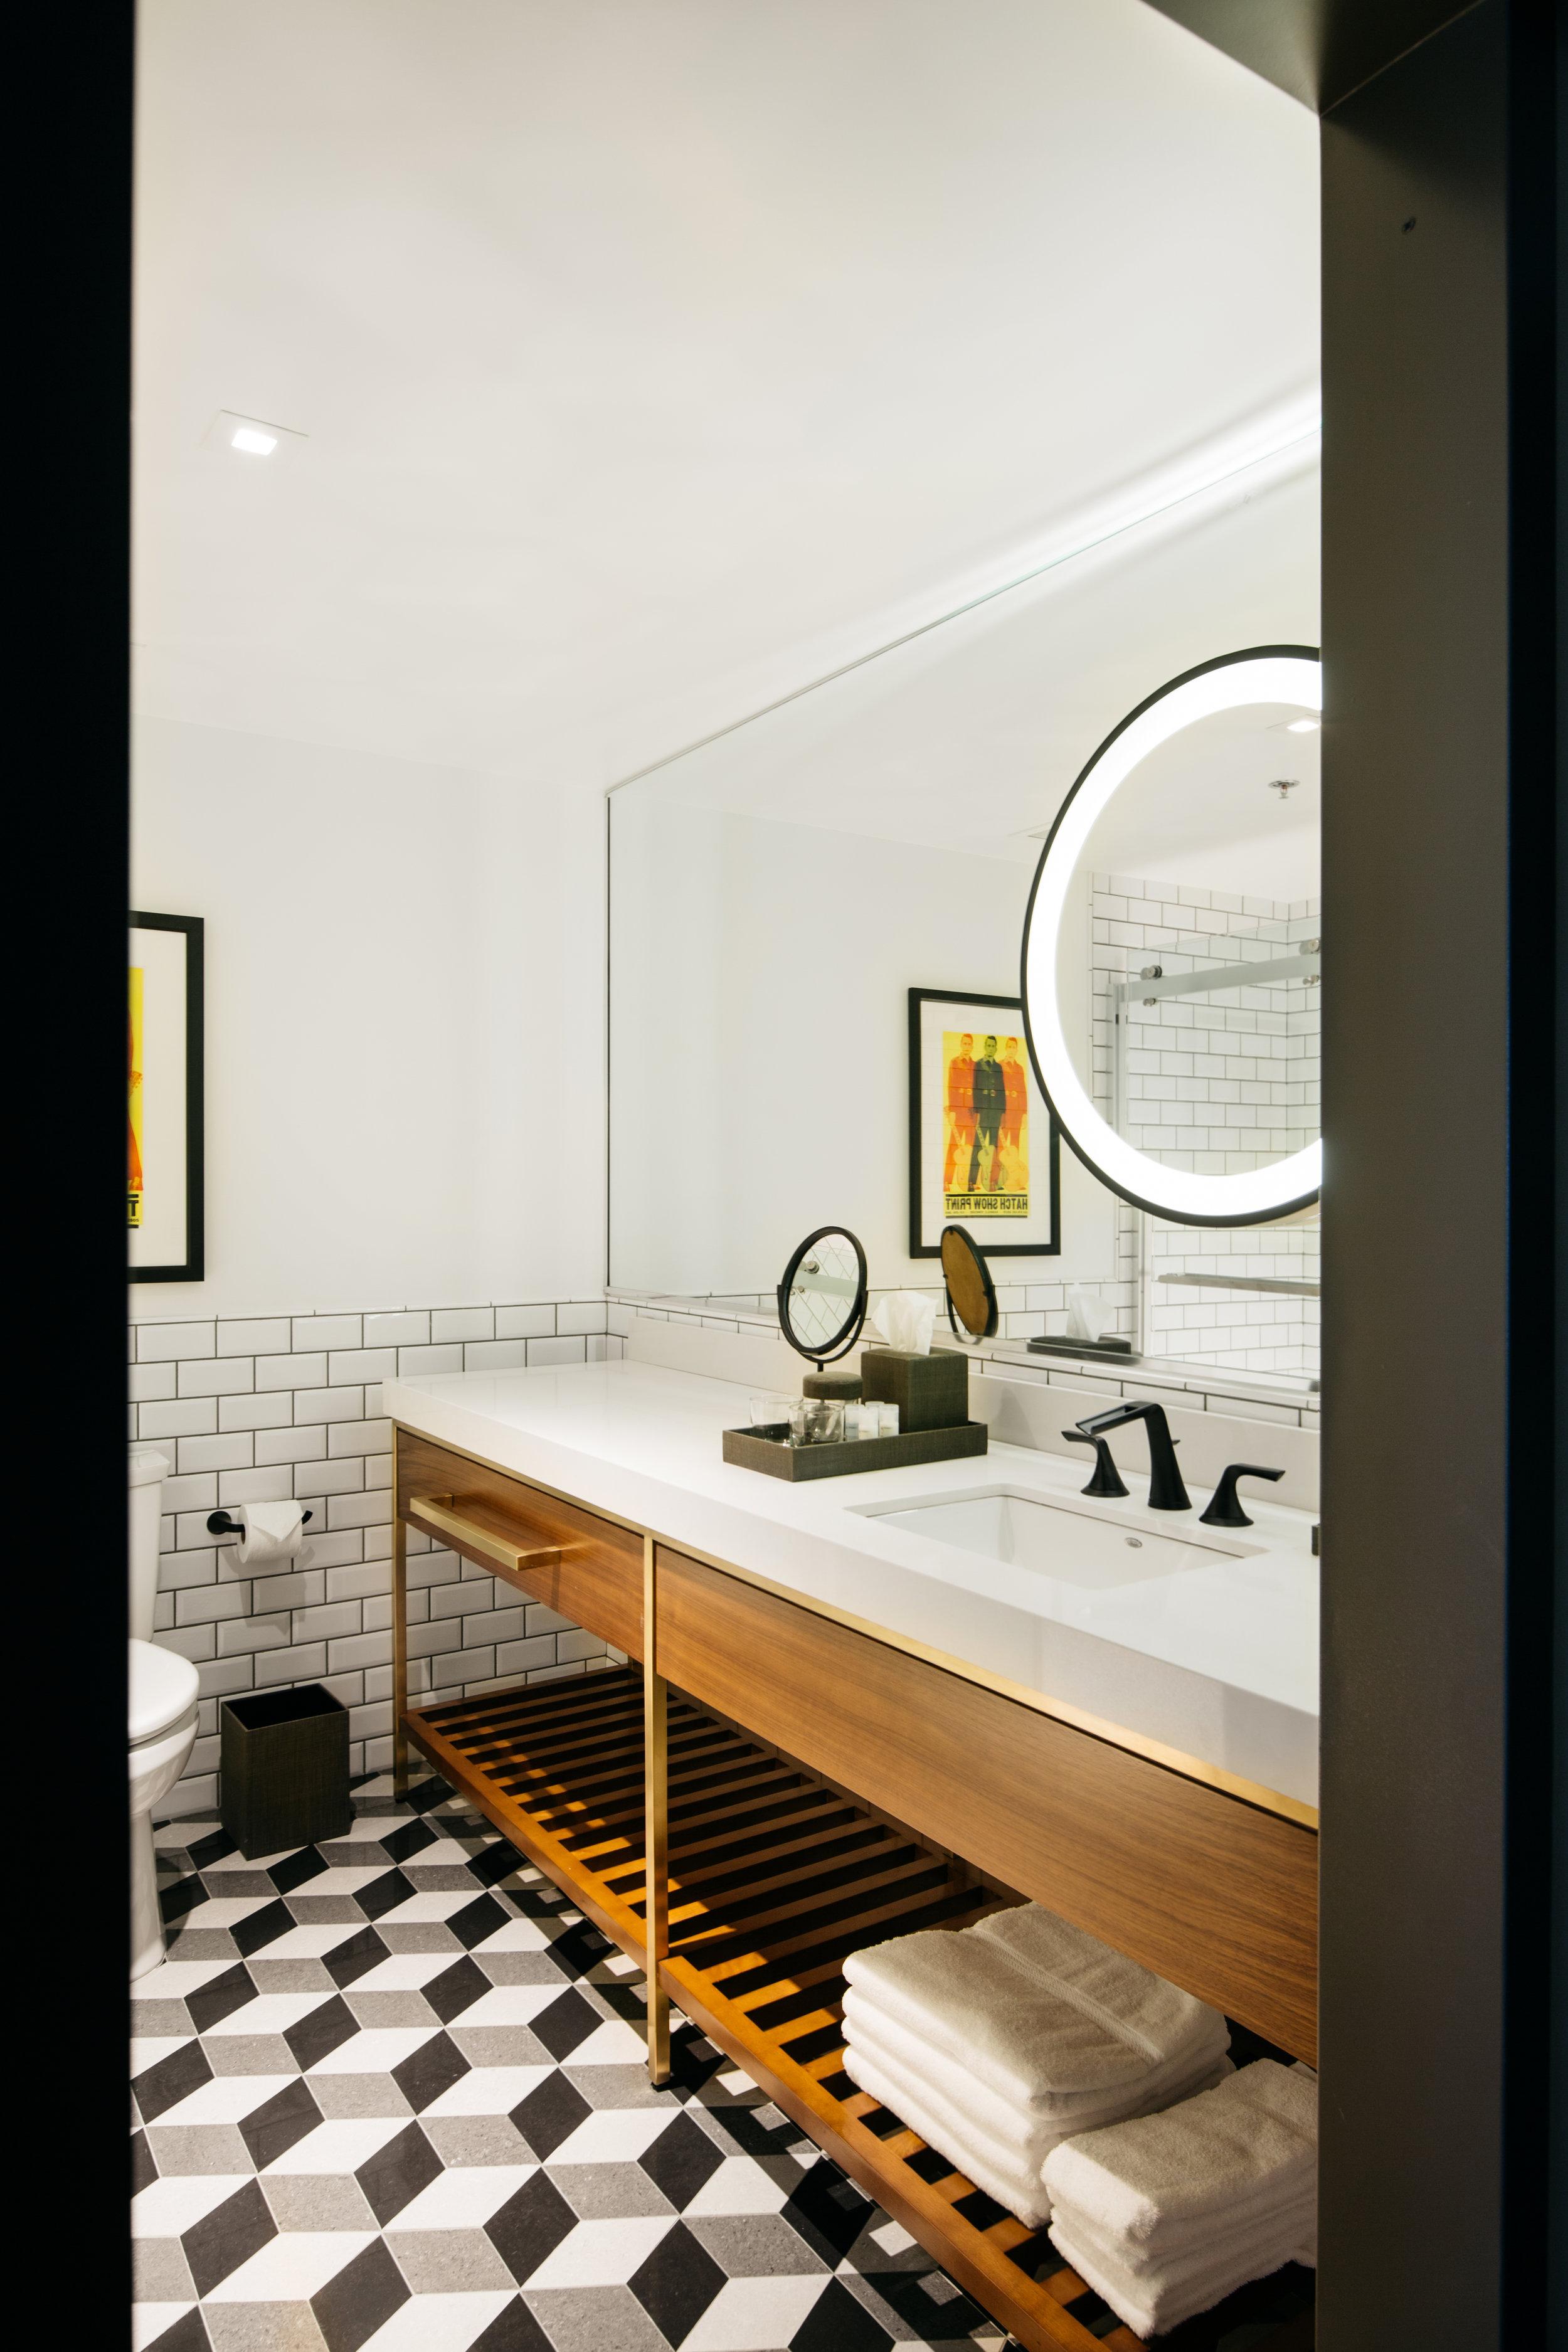 DblKing_Bathroom1.jpg